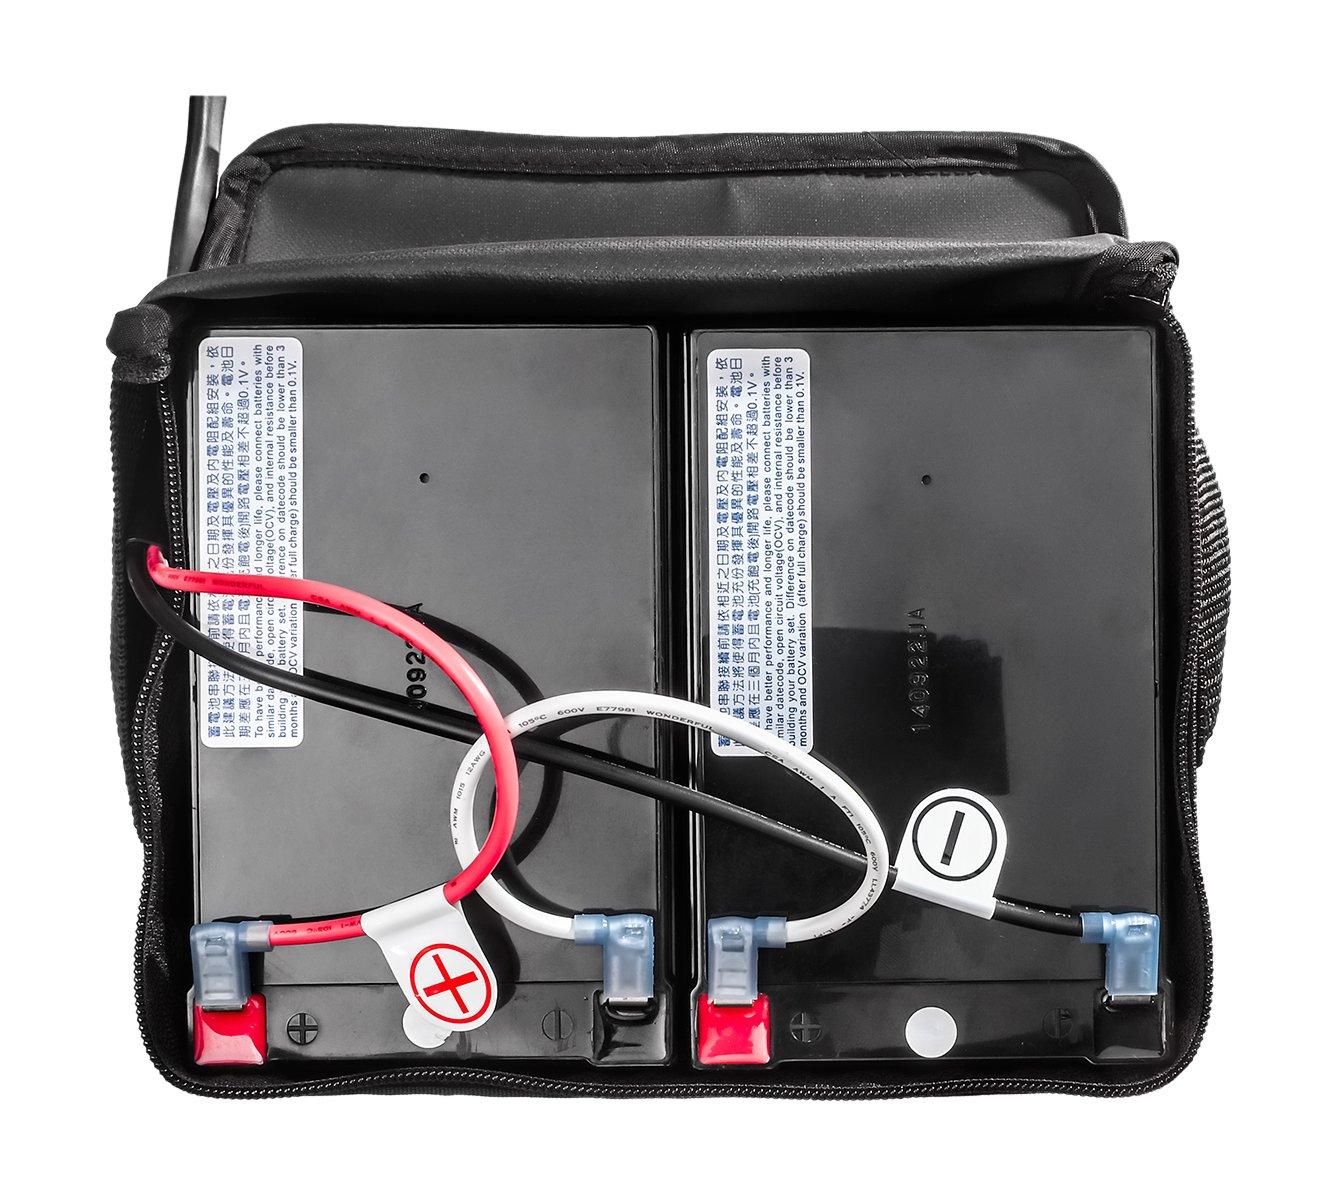 FreeRider USA Luggie Classic Lead Acid Battery_Single Unit by FreeRider USA